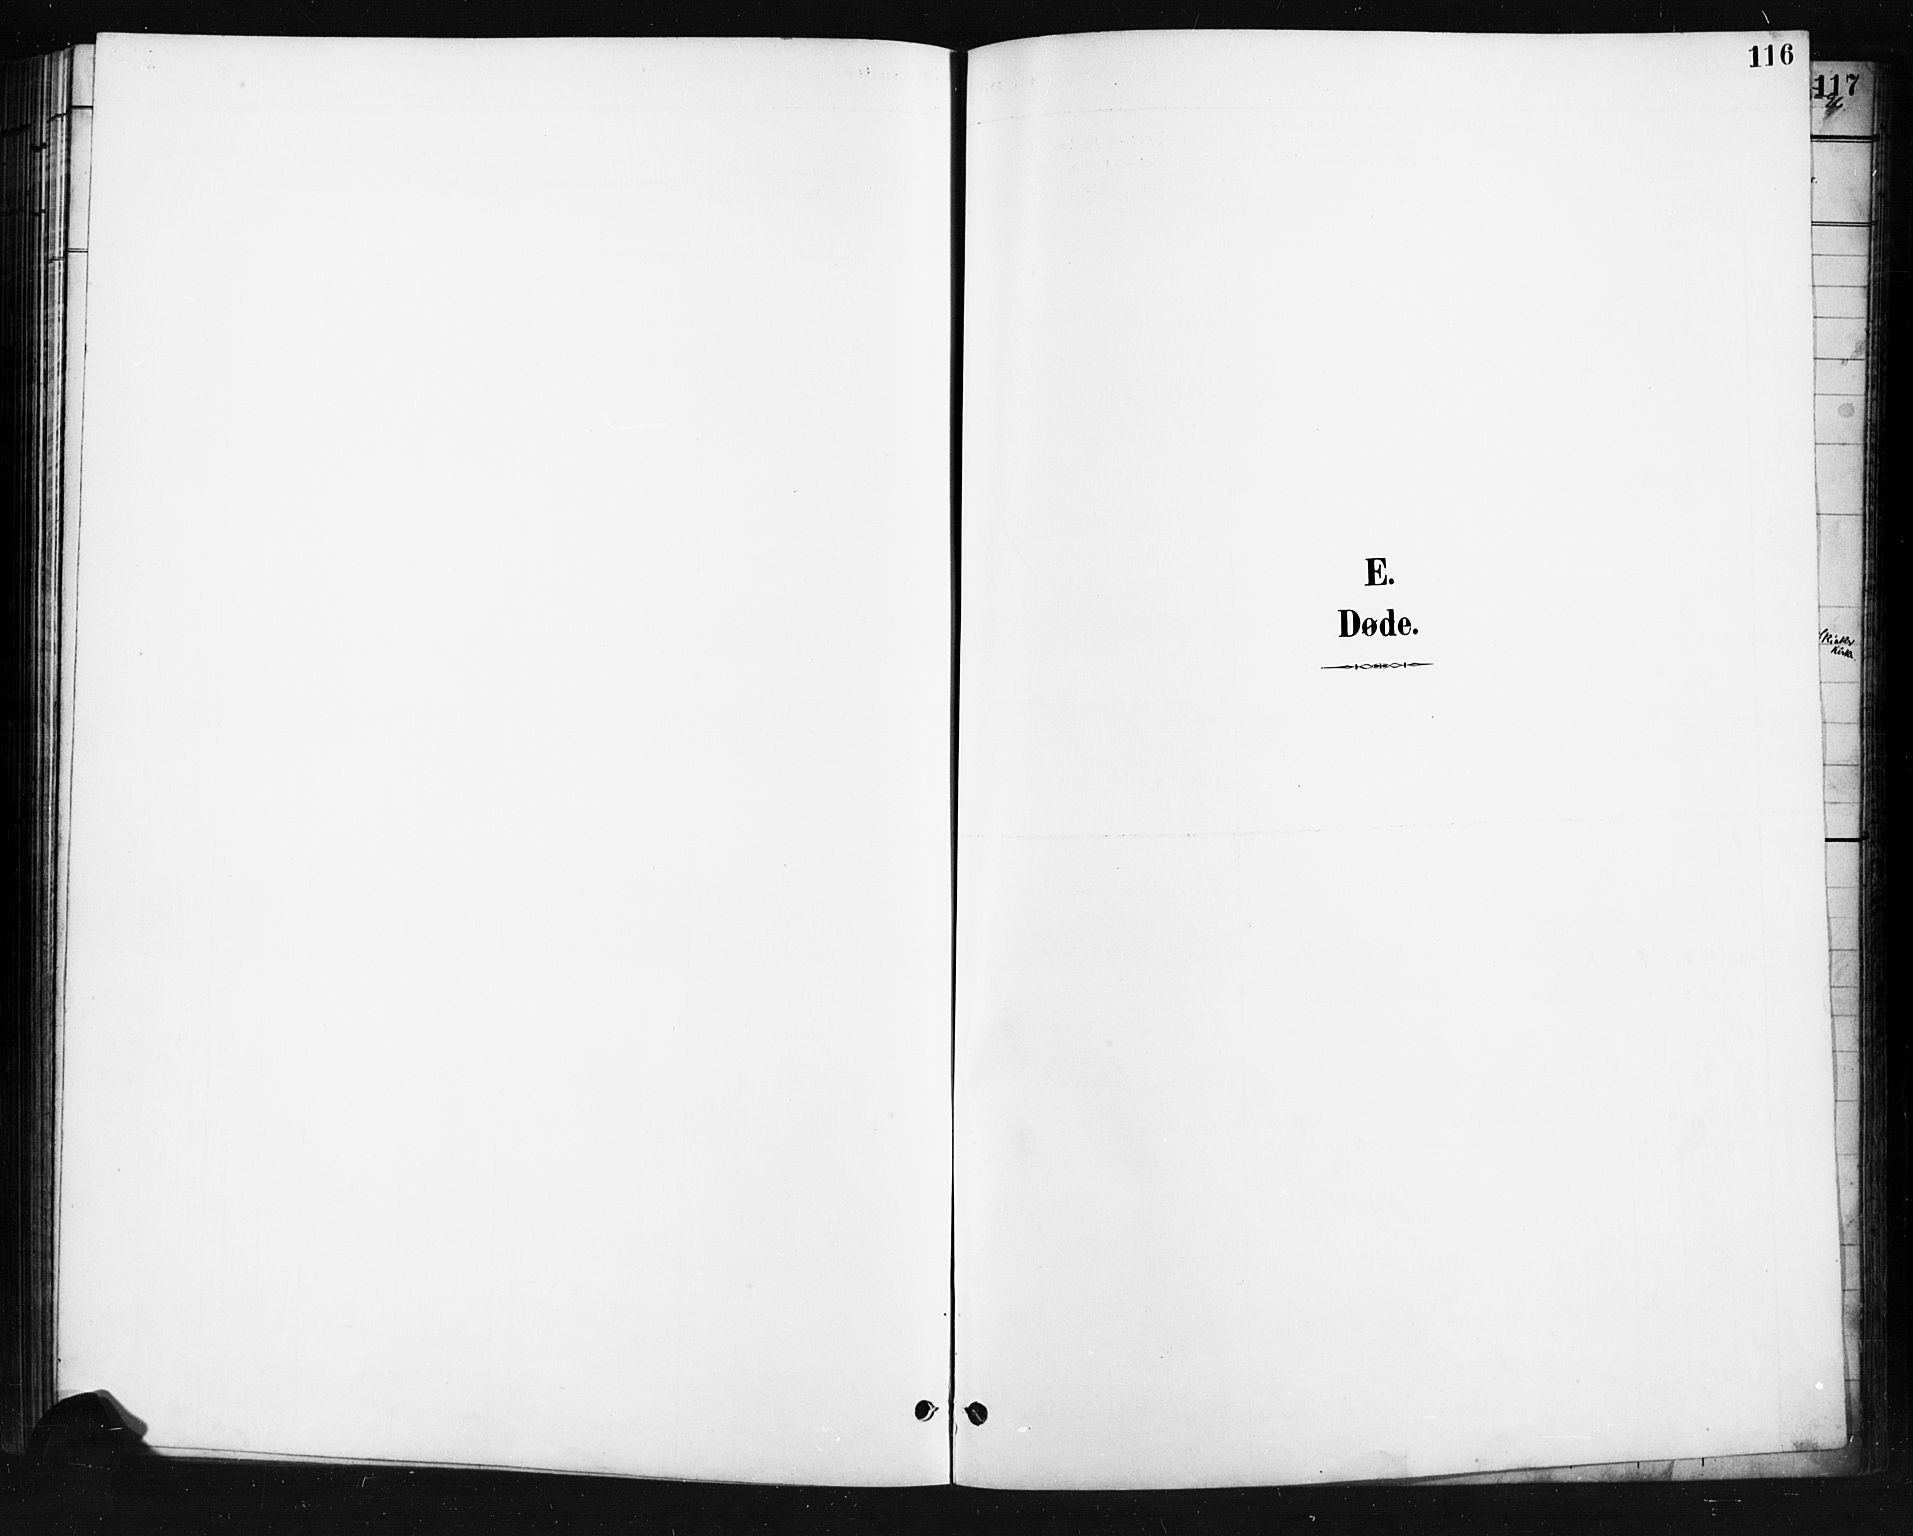 SAH, Skjåk prestekontor, Klokkerbok nr. 4, 1895-1921, s. 116